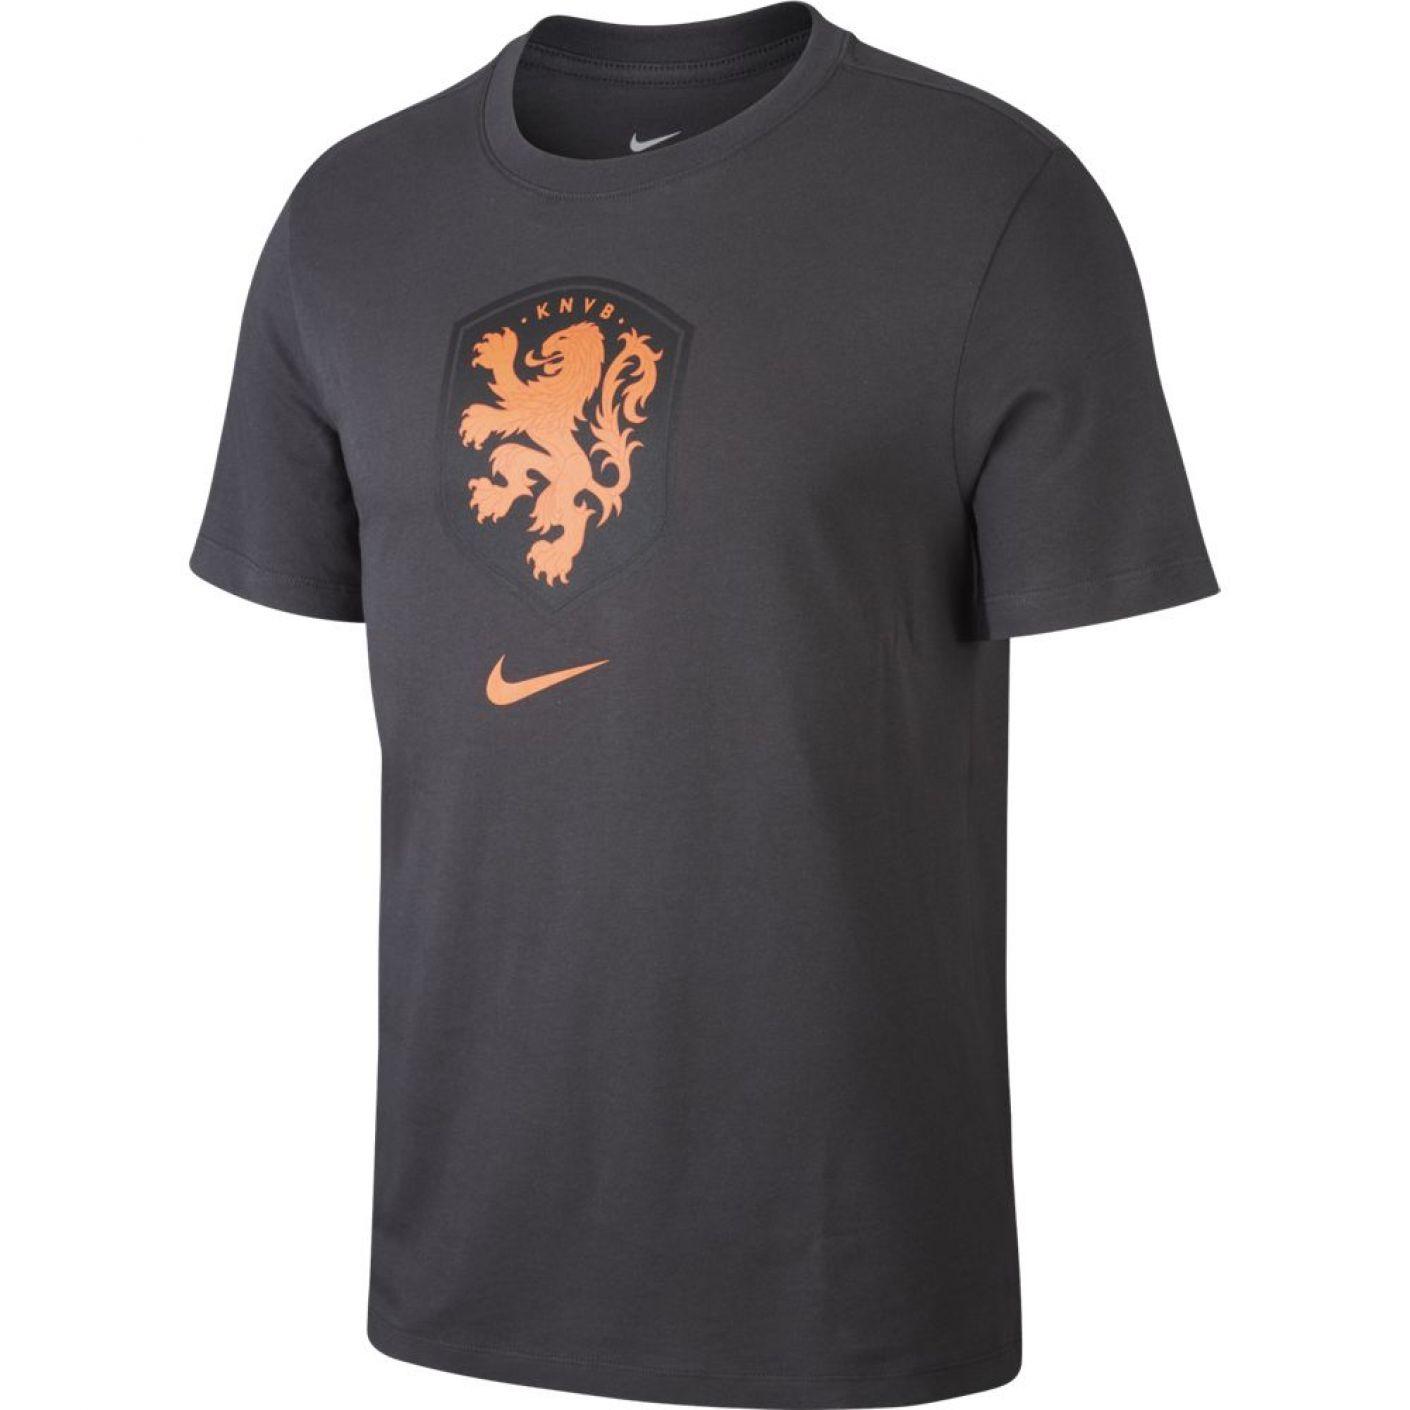 Nike Nederland T-Shirt Logo Antraciet